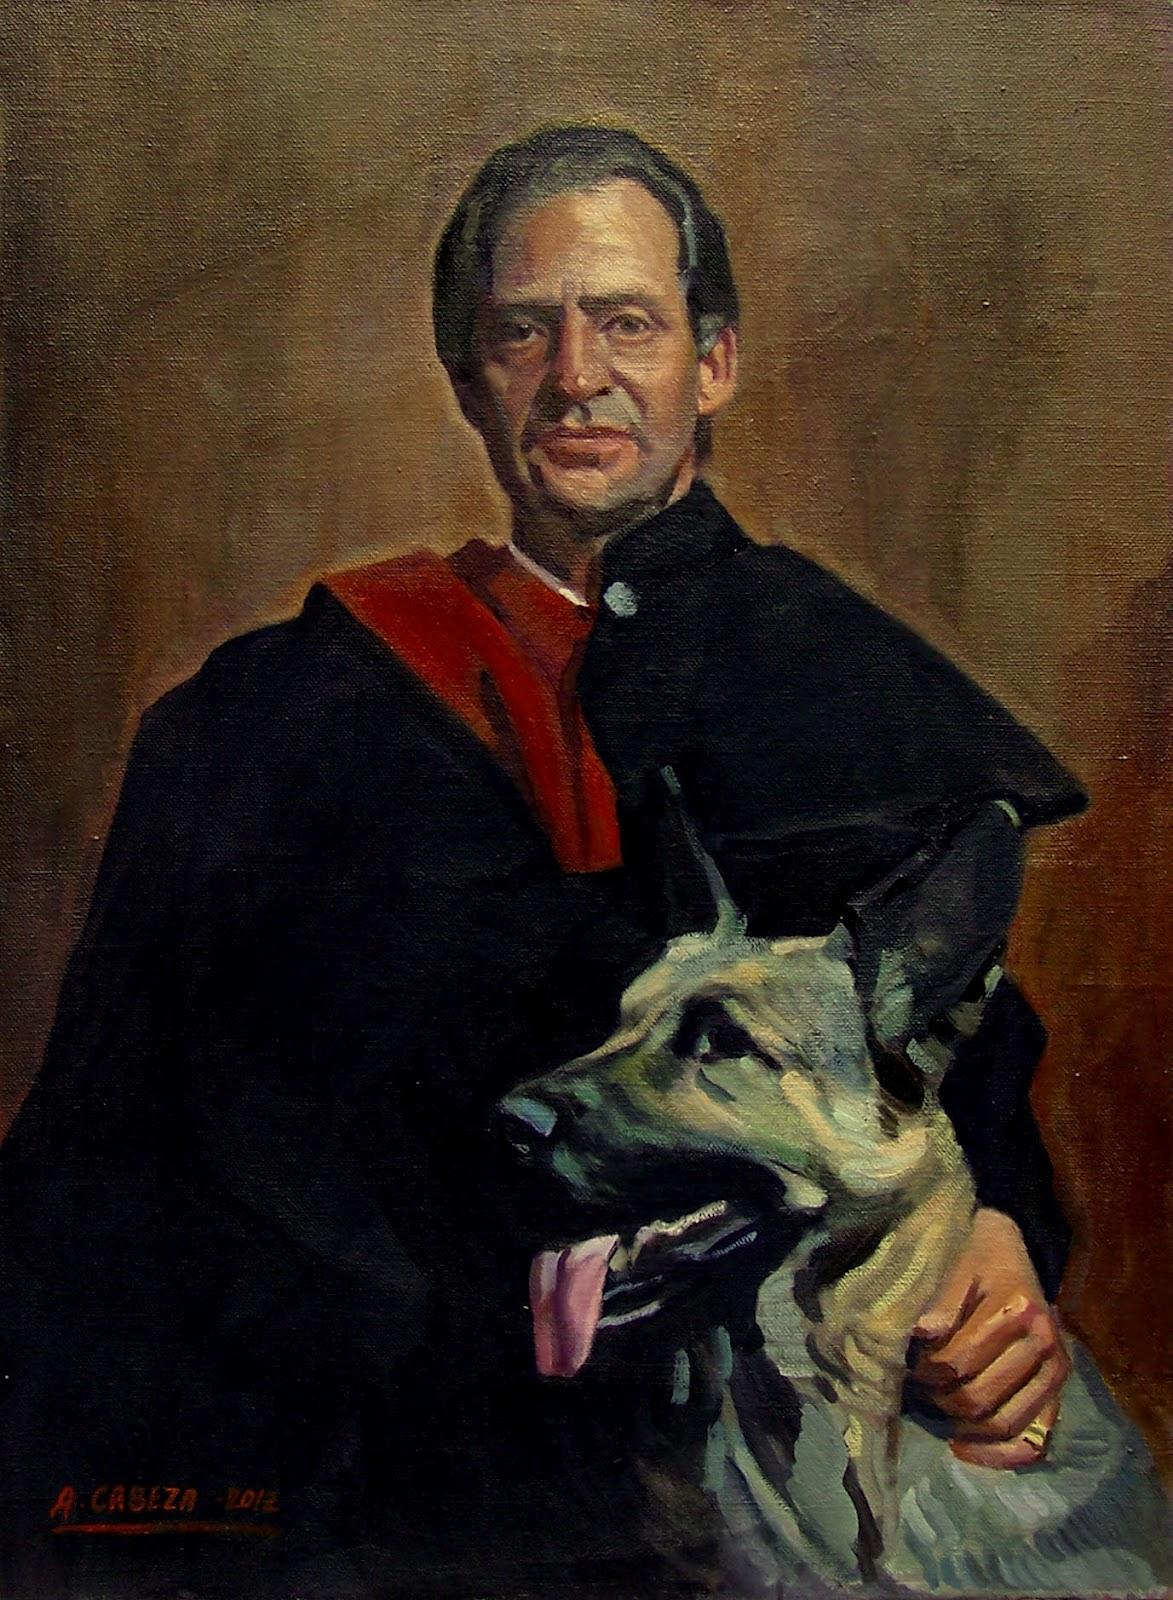 Juan Carlo Net Worth